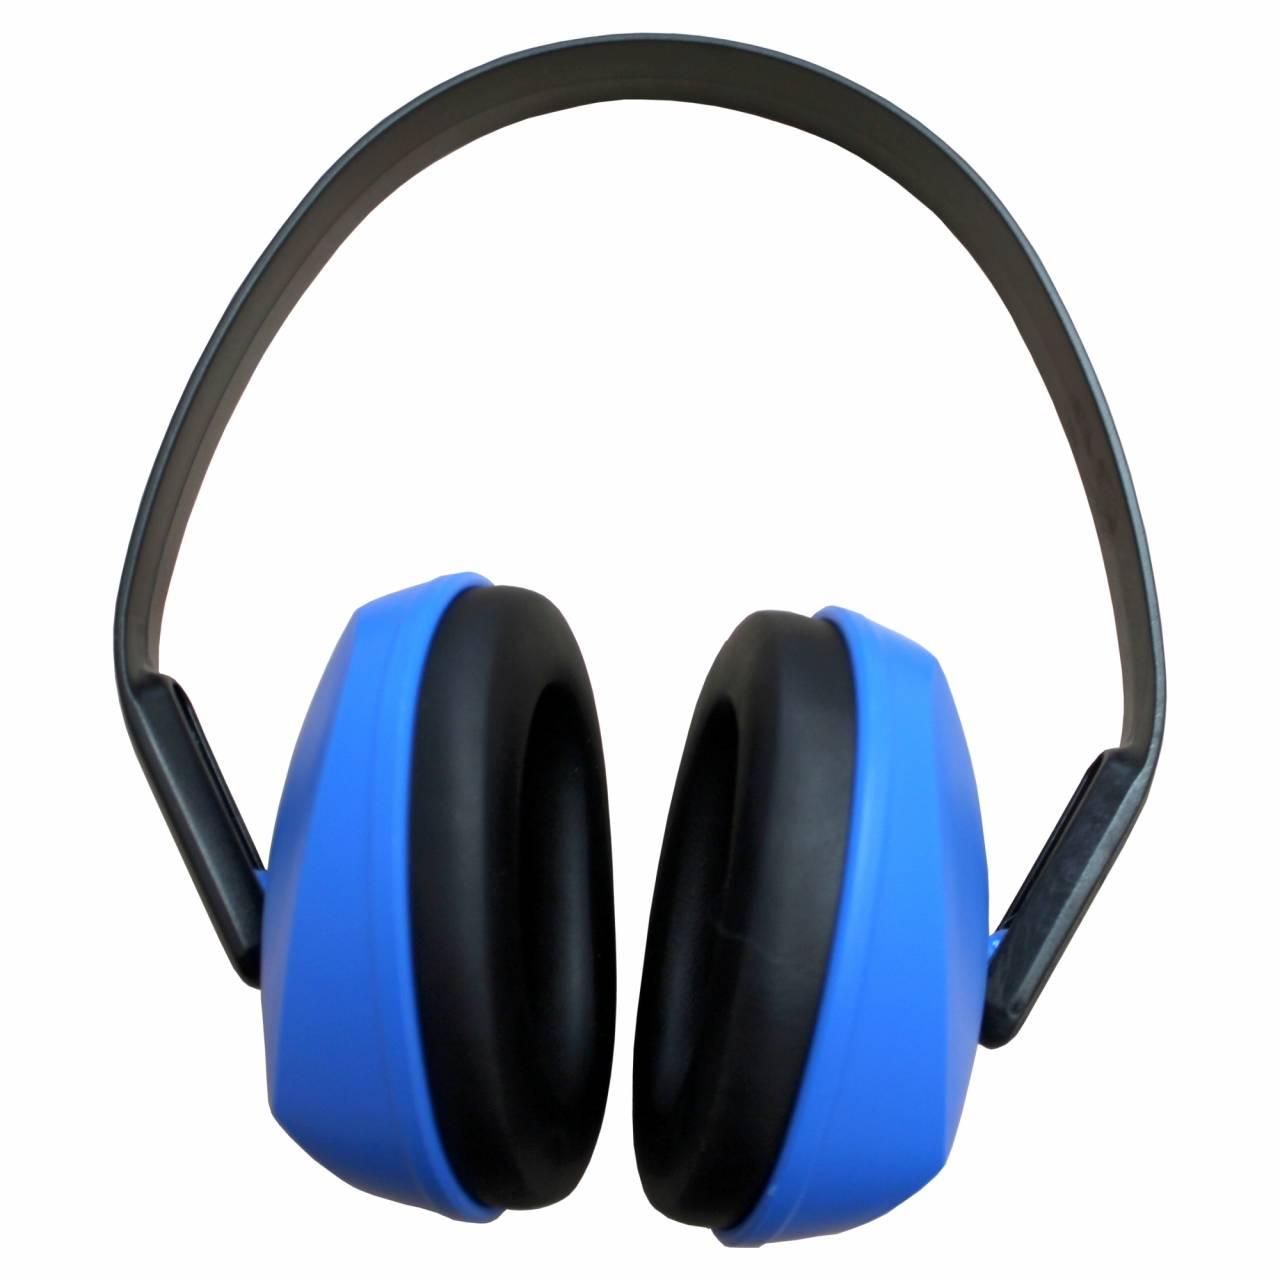 Gehörschutz EN352 'Super' SNR 27 dB